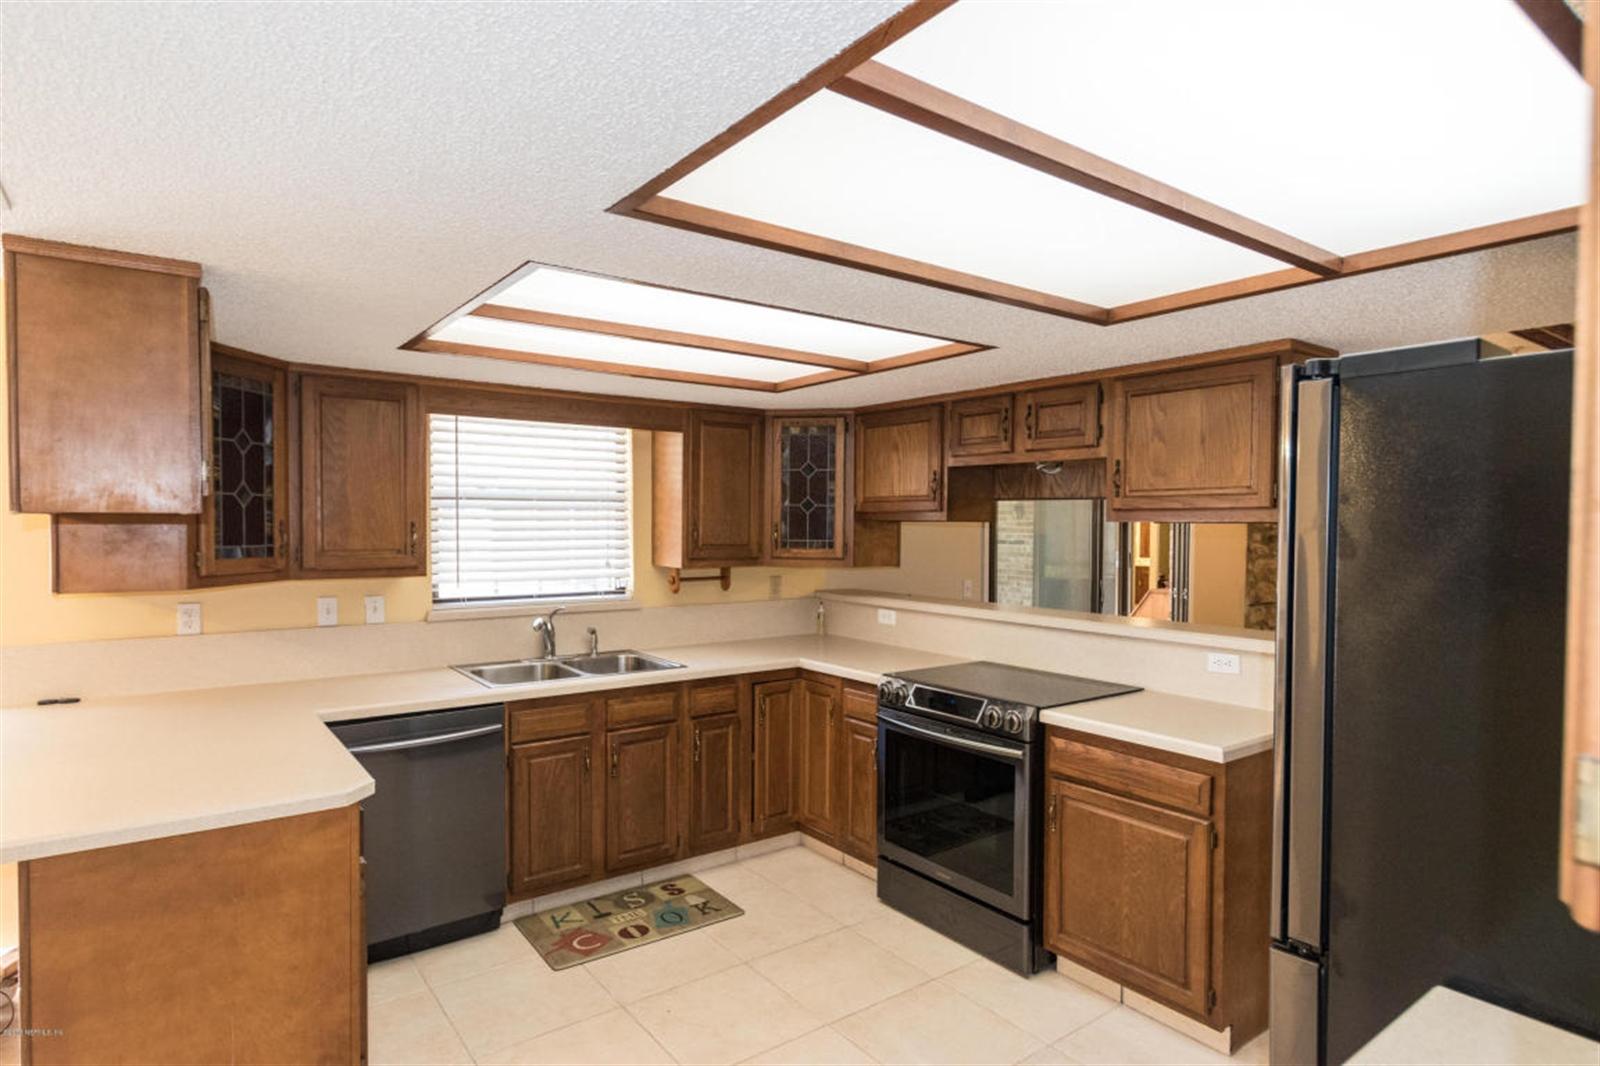 Real Estate Photography - 816 Whisper Cove Trl, Jacksonville, FL, 32221 - Location 11